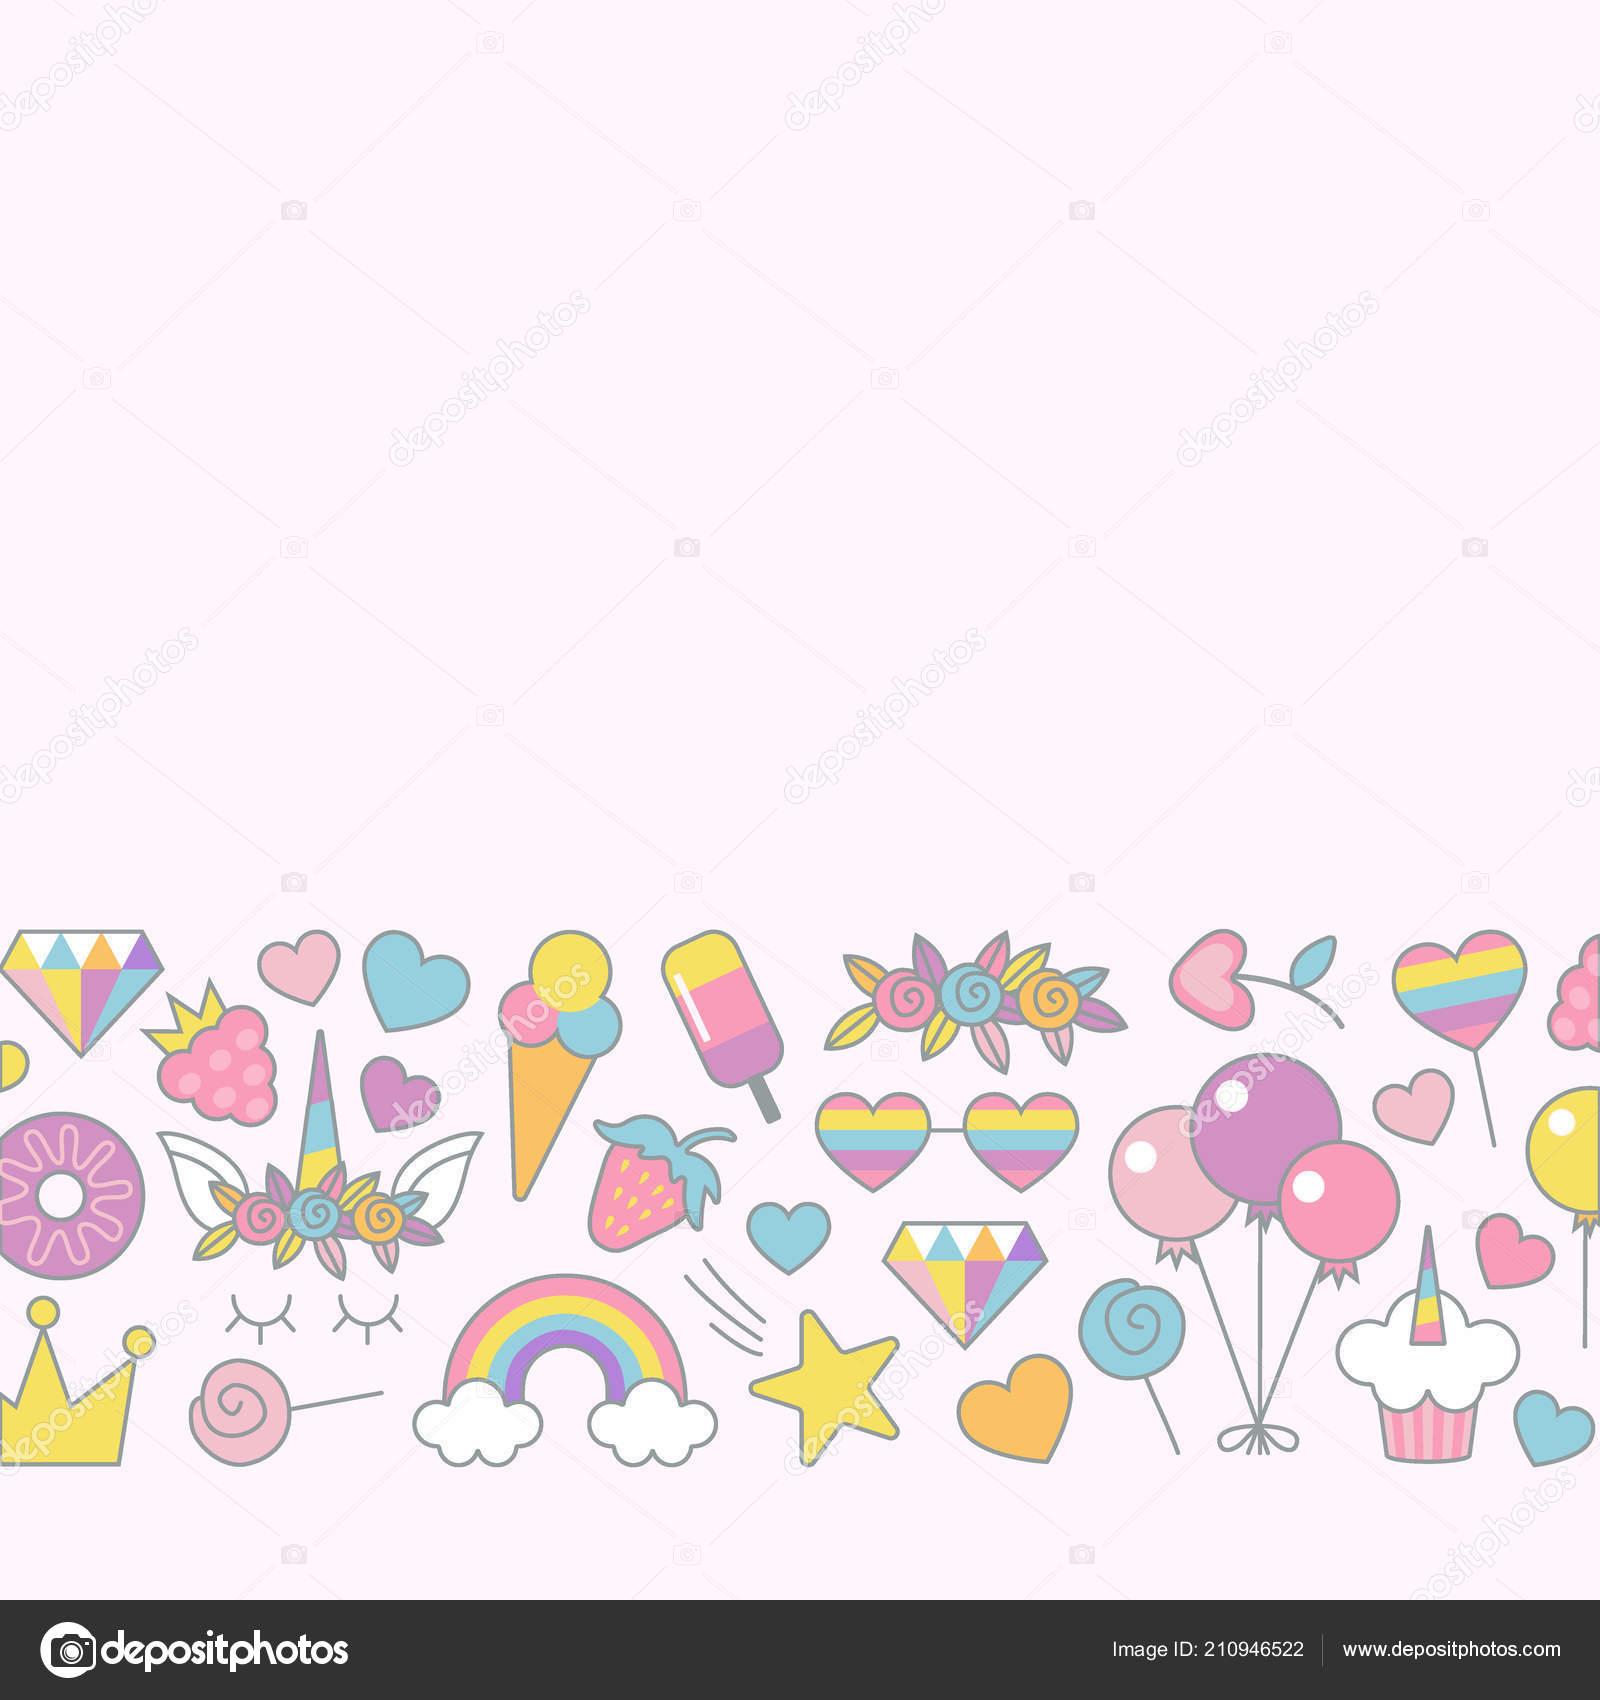 Unicorn objects flat vector design for greeting birthday unicorn objects flat vector design for greeting birthday invitation card vetor de stock stopboris Gallery